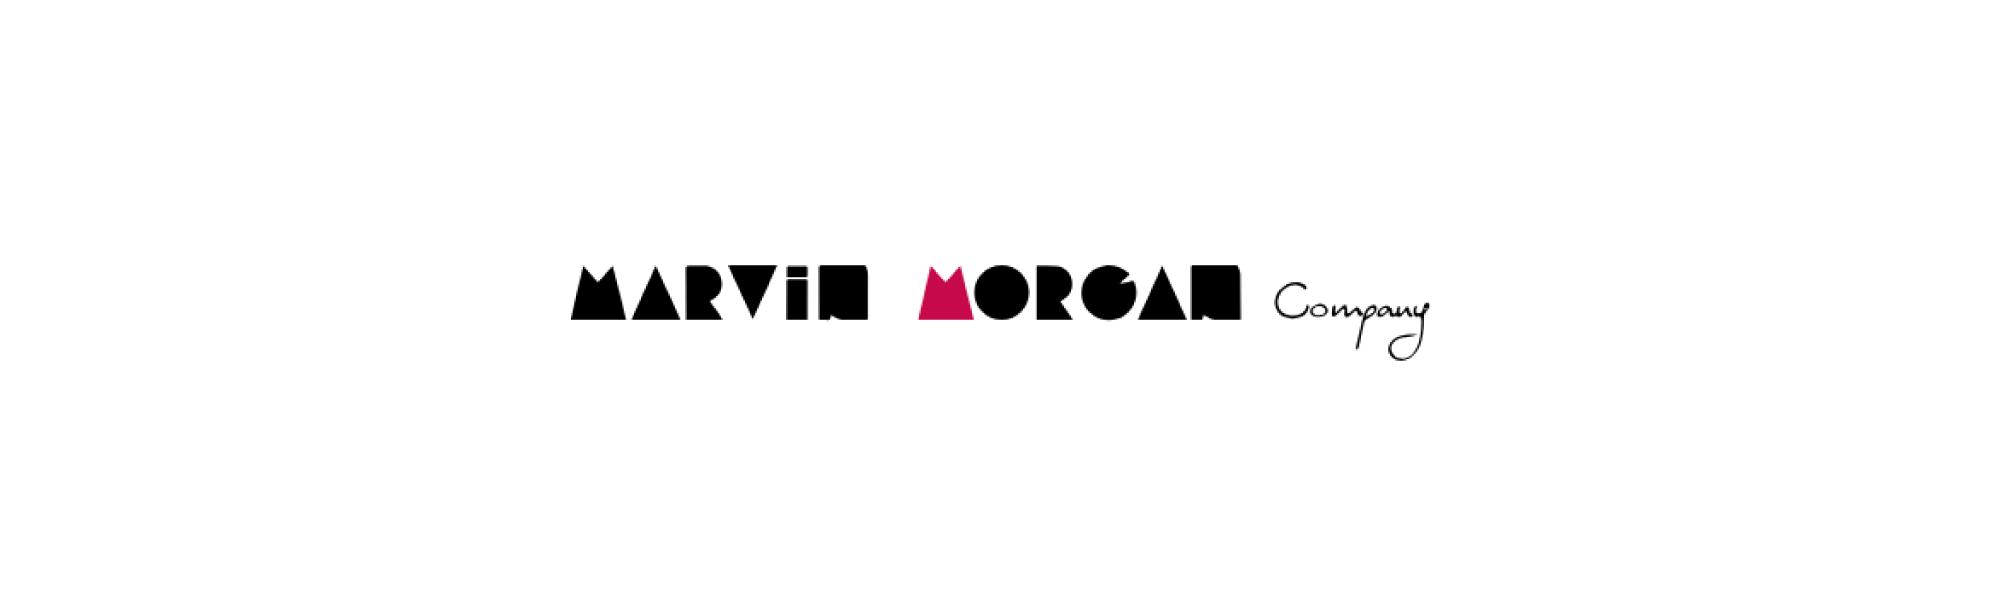 MarvinMorgan_Logo.png